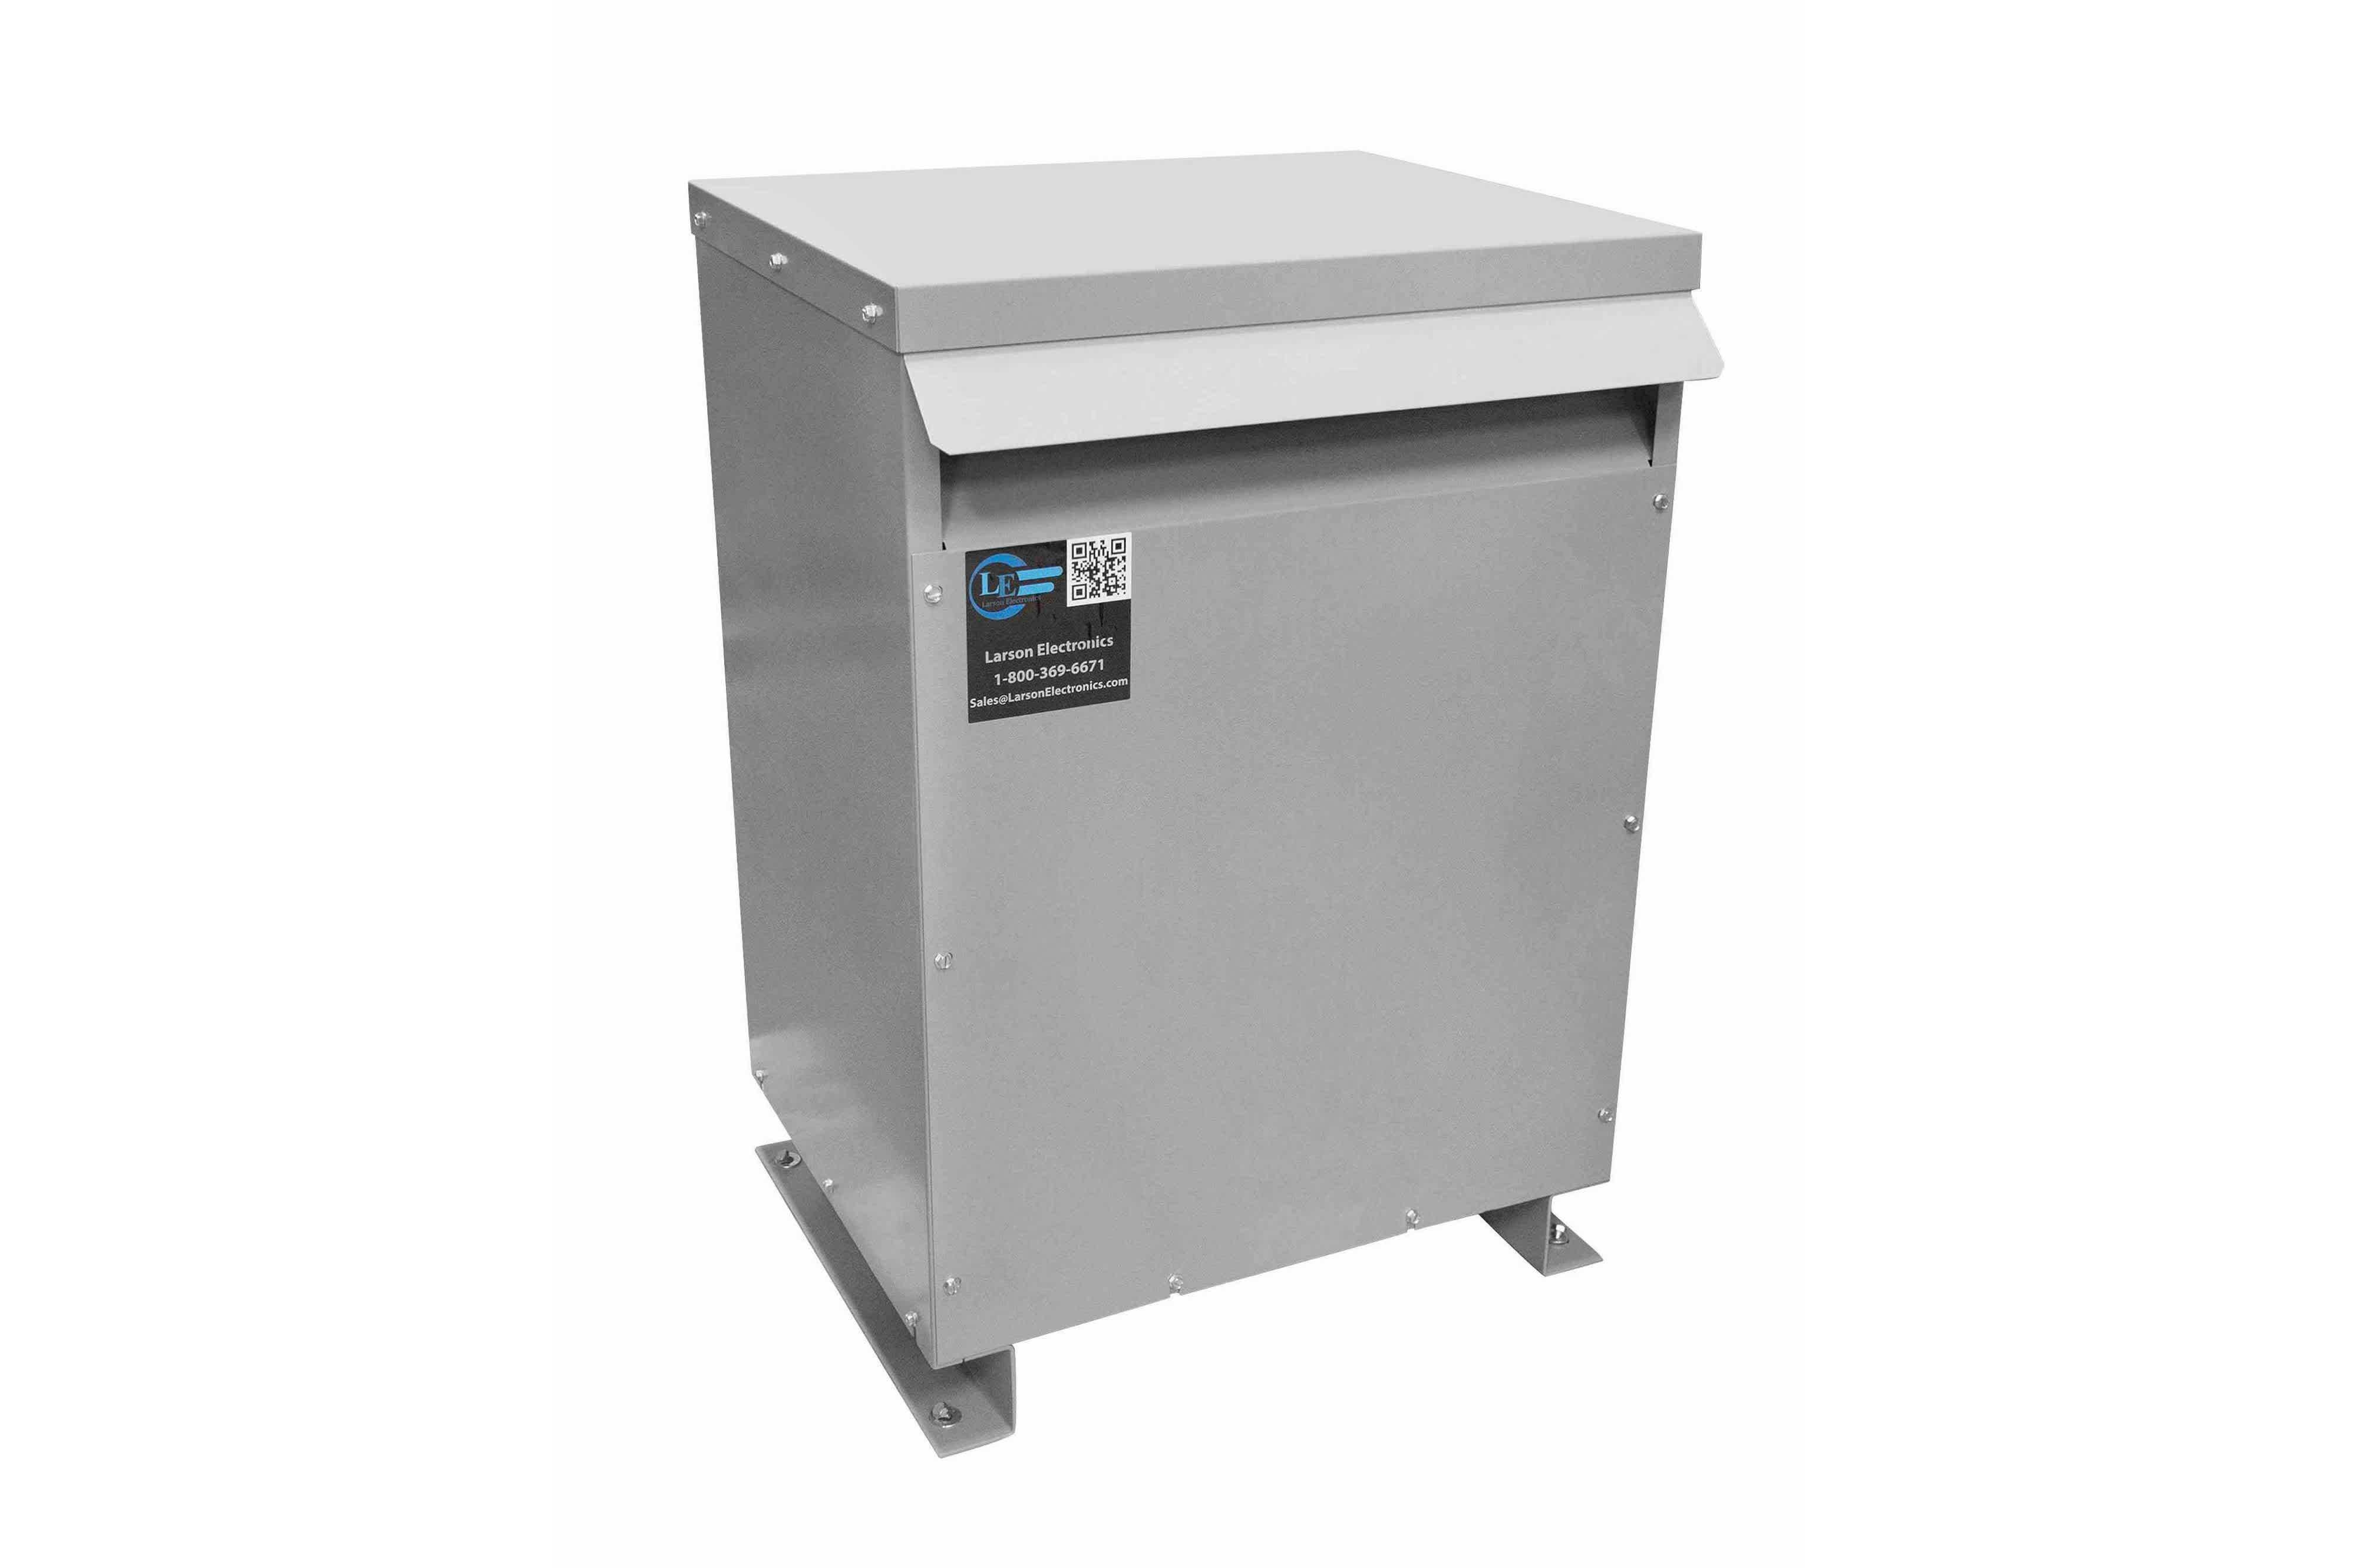 400 kVA 3PH Isolation Transformer, 208V Wye Primary, 208Y/120 Wye-N Secondary, N3R, Ventilated, 60 Hz